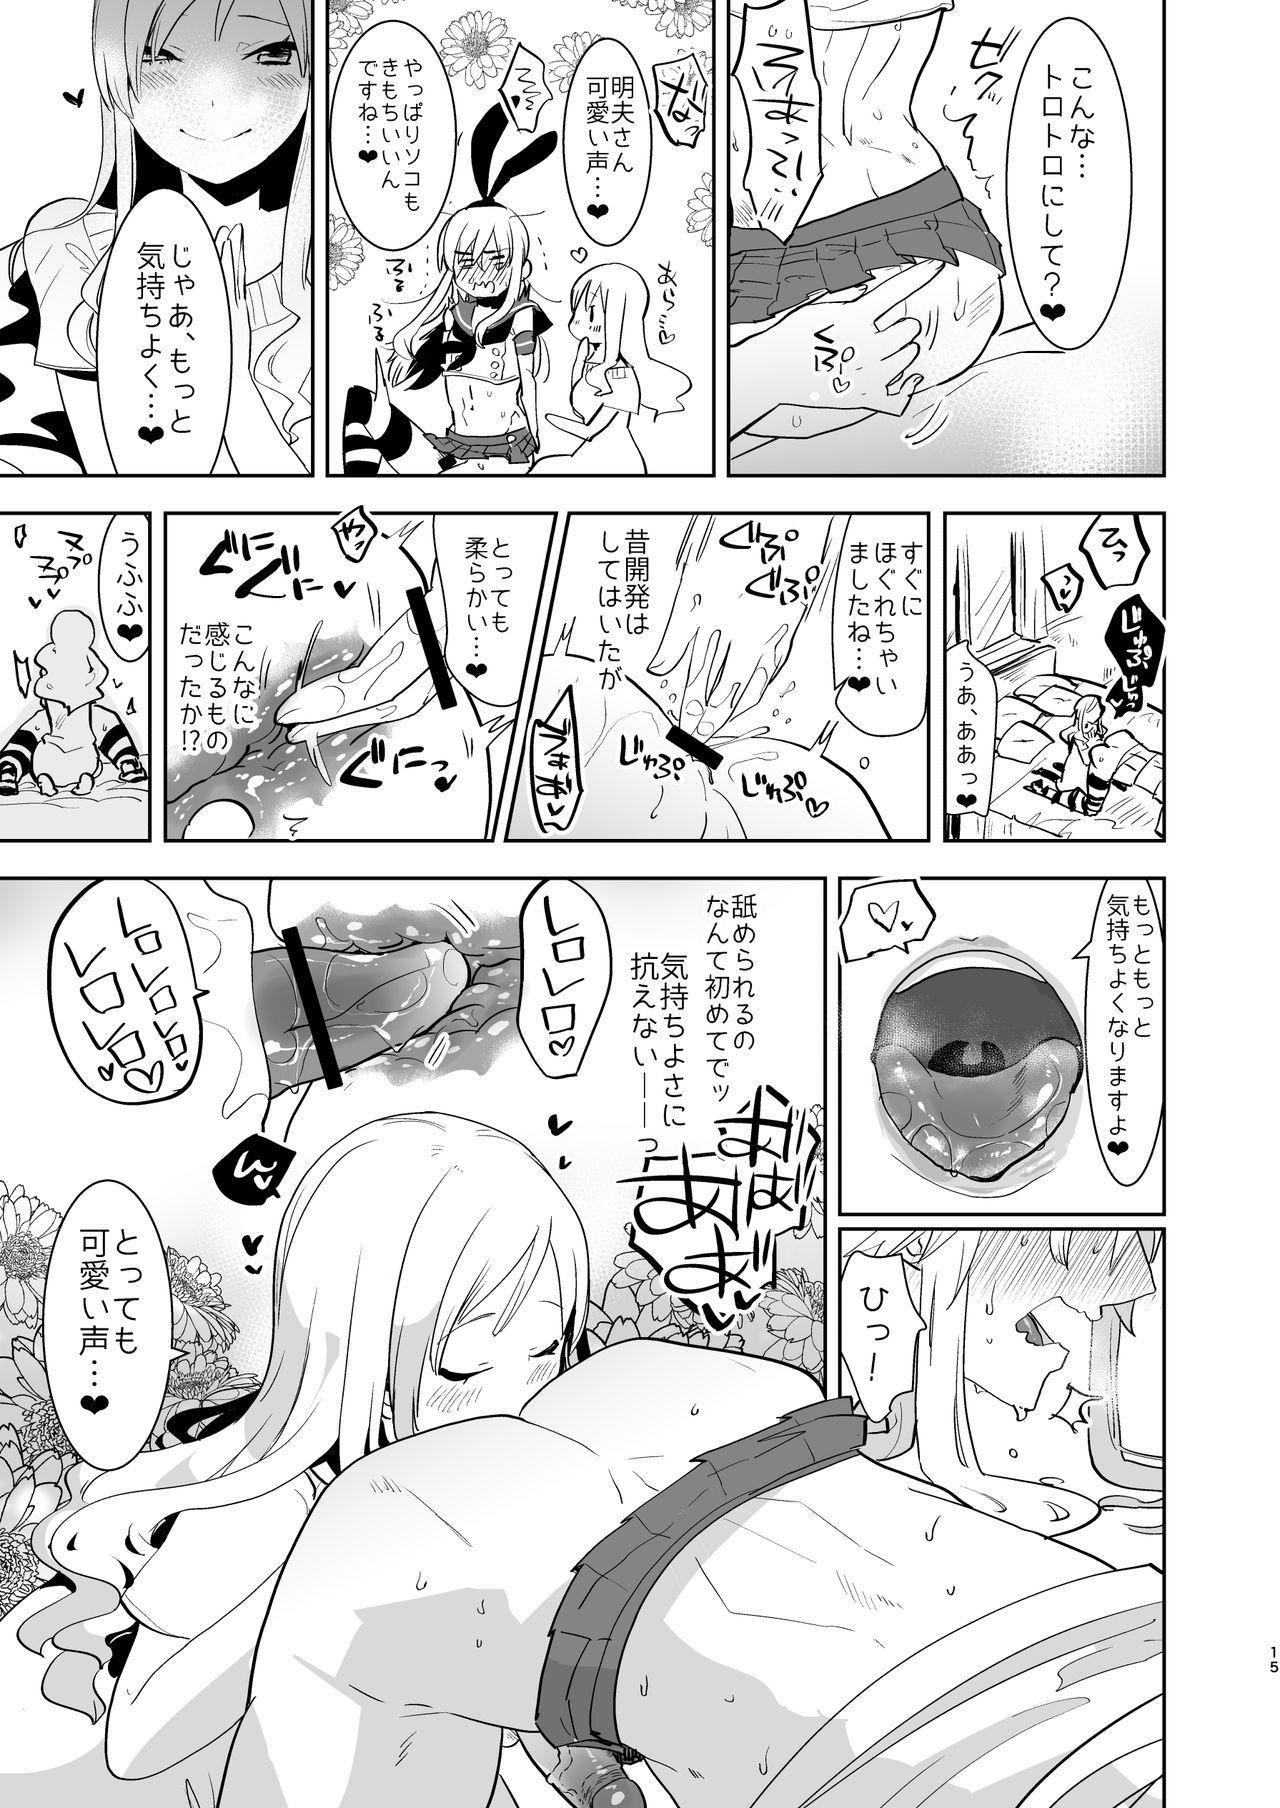 [Aimaitei (Aimaitei Umami)] Otto wa Shimakaze-kun 30-sai [Digital] 14